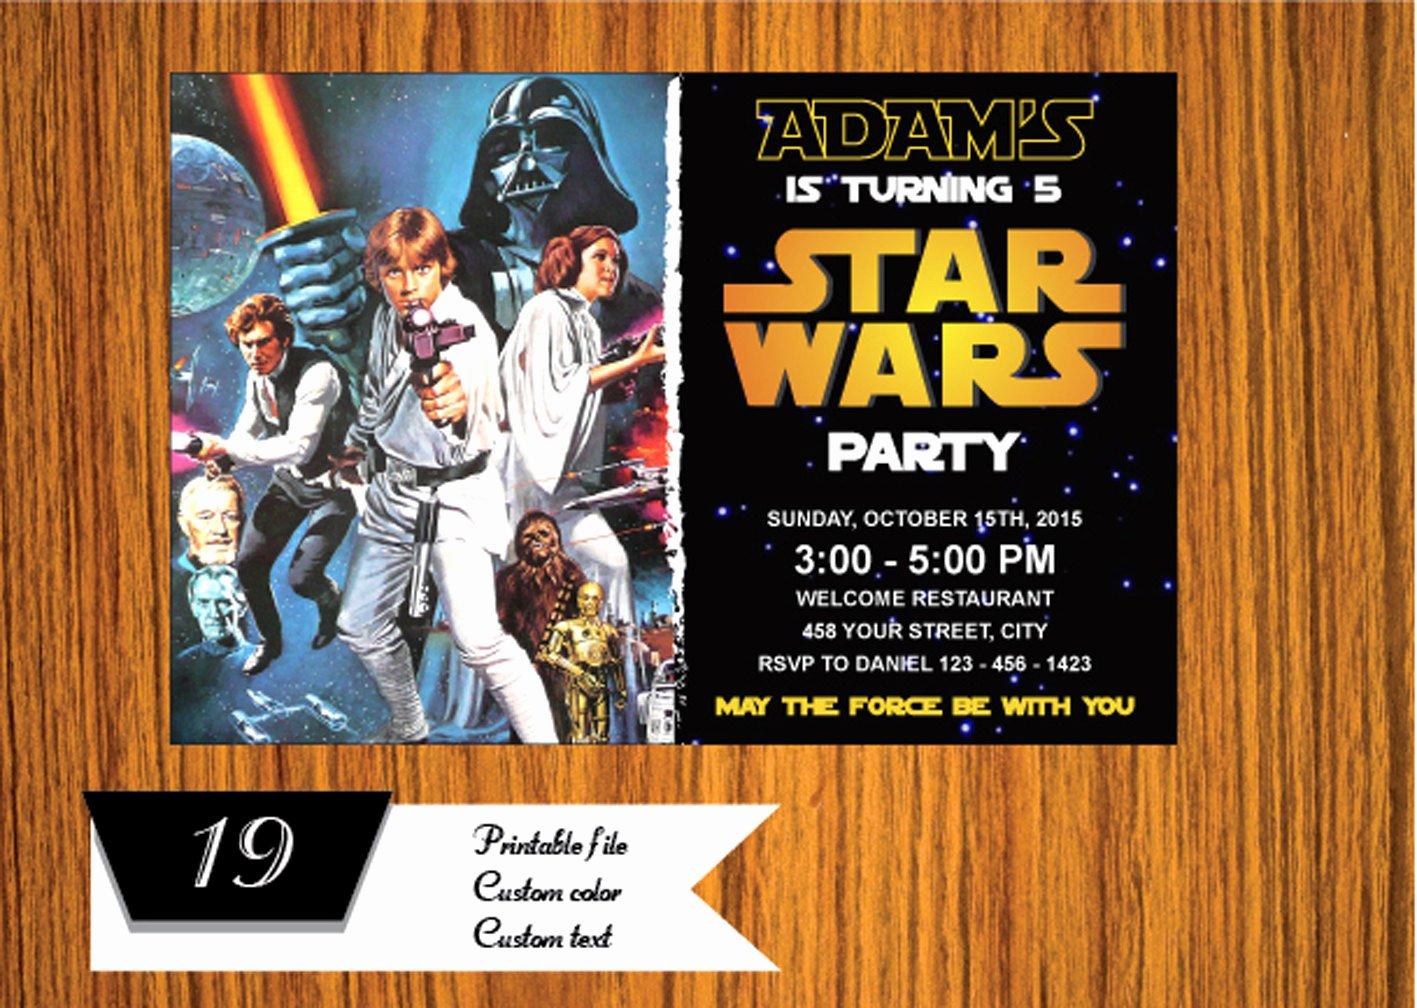 Star Wars Invitations Wording Fresh Star Wars Star Wars Invitation Star Wars Birthday